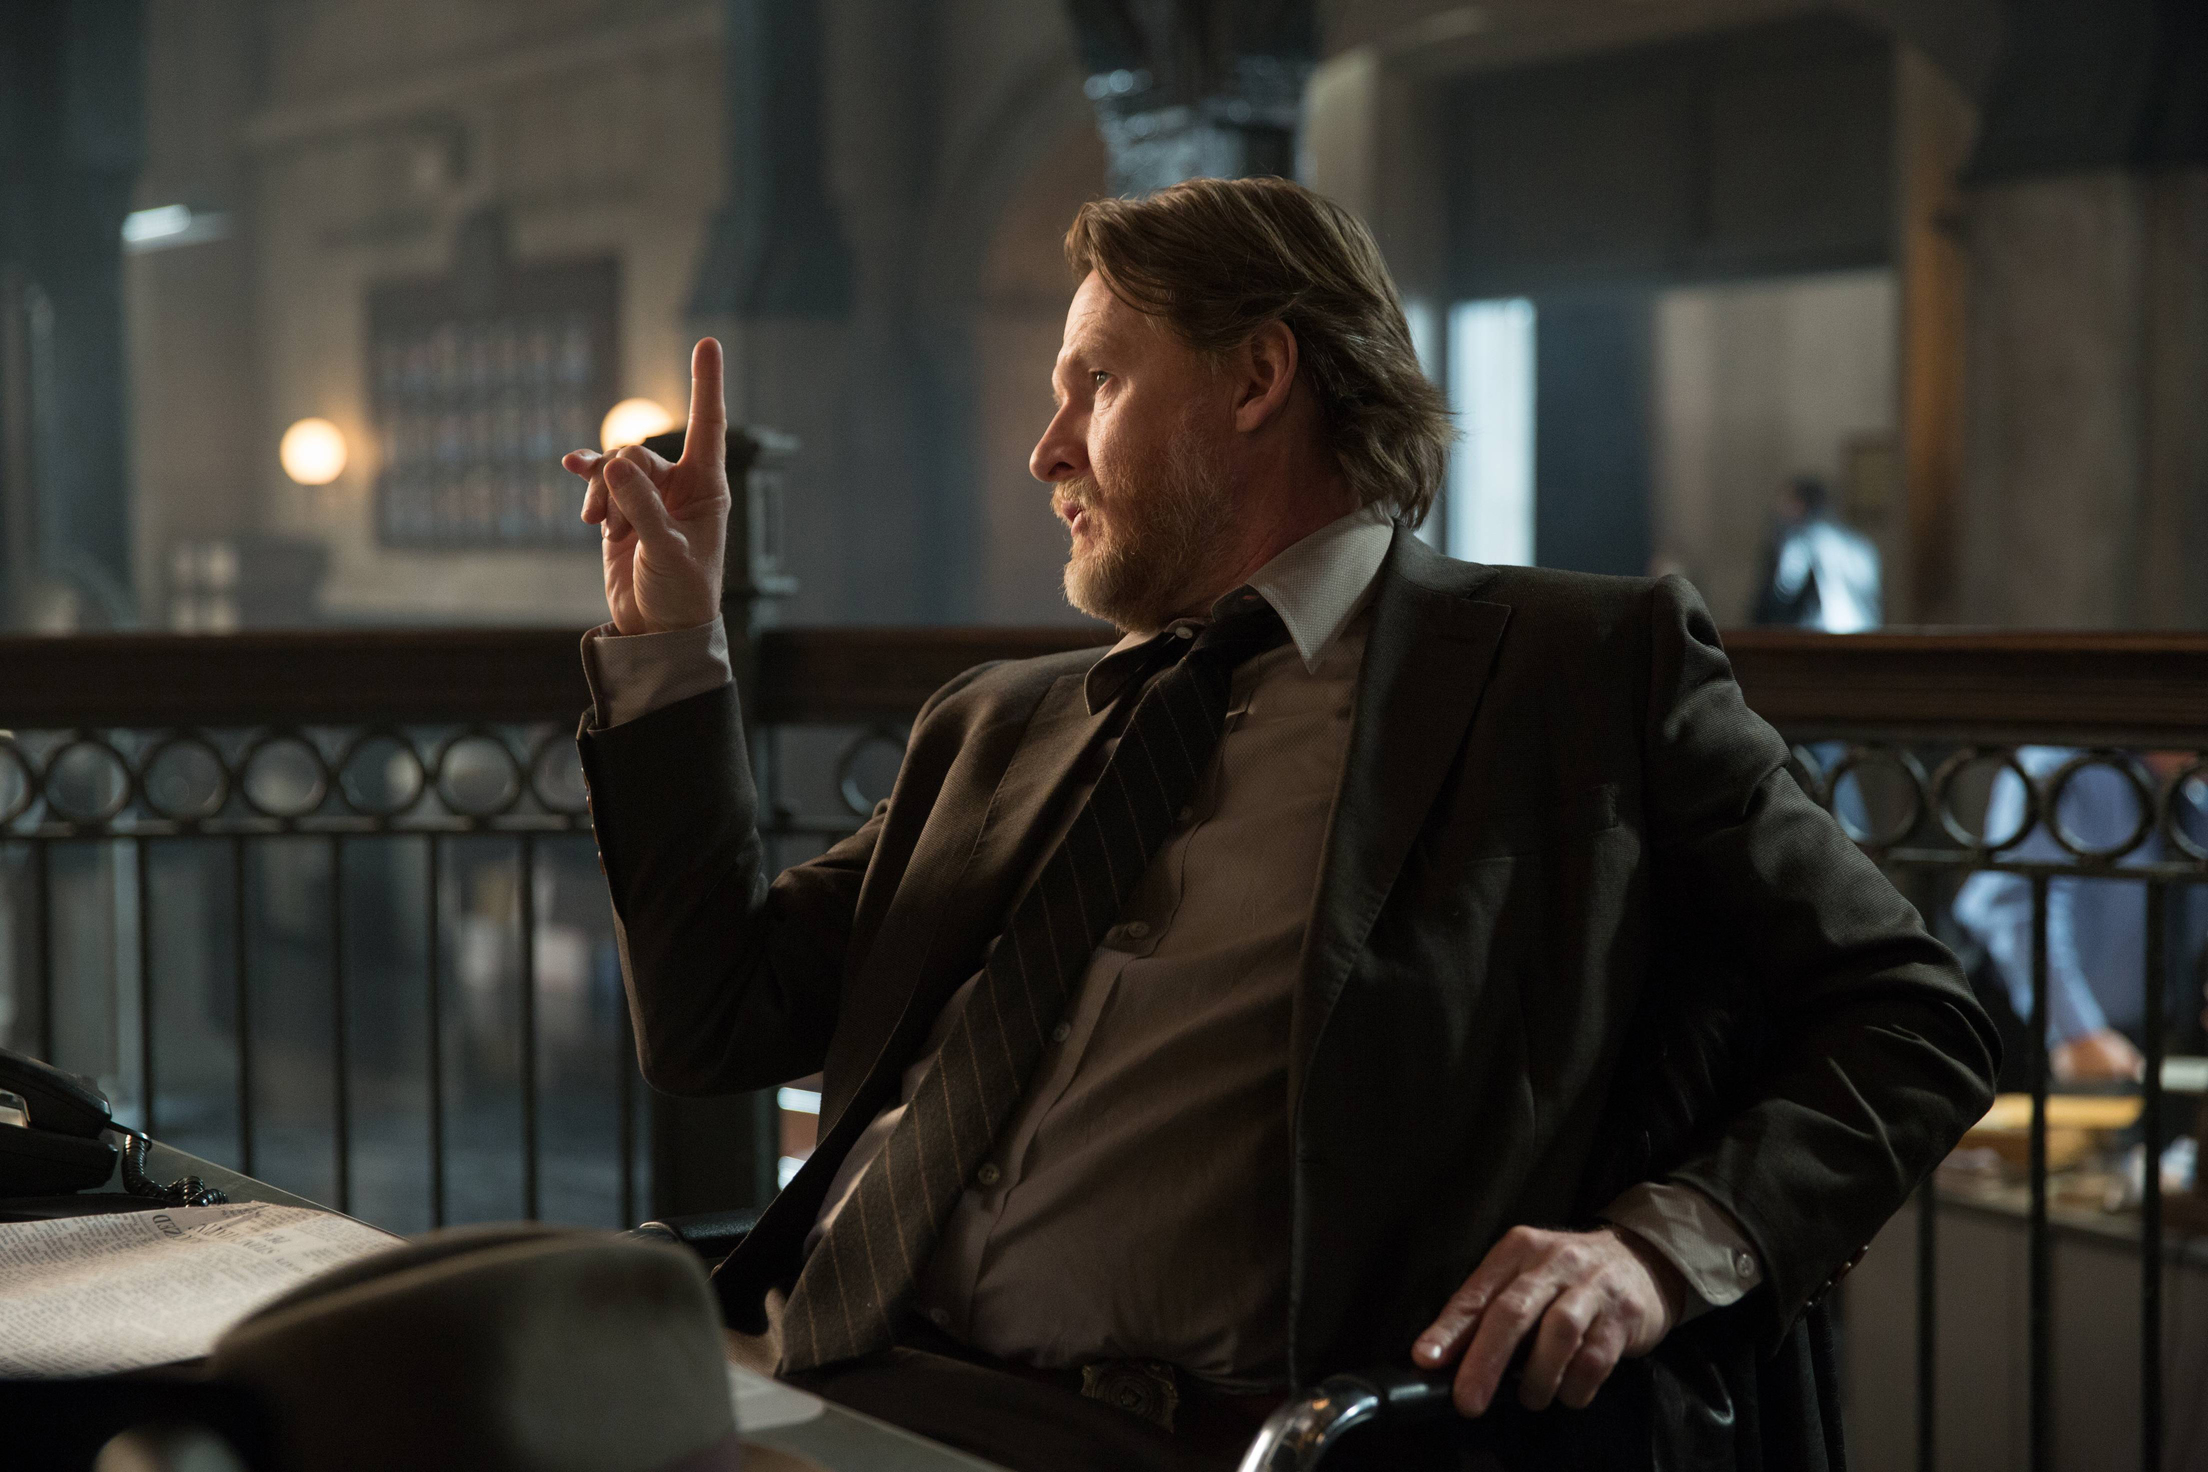 Gotham - Episode 1.19 - Beasts of Prey